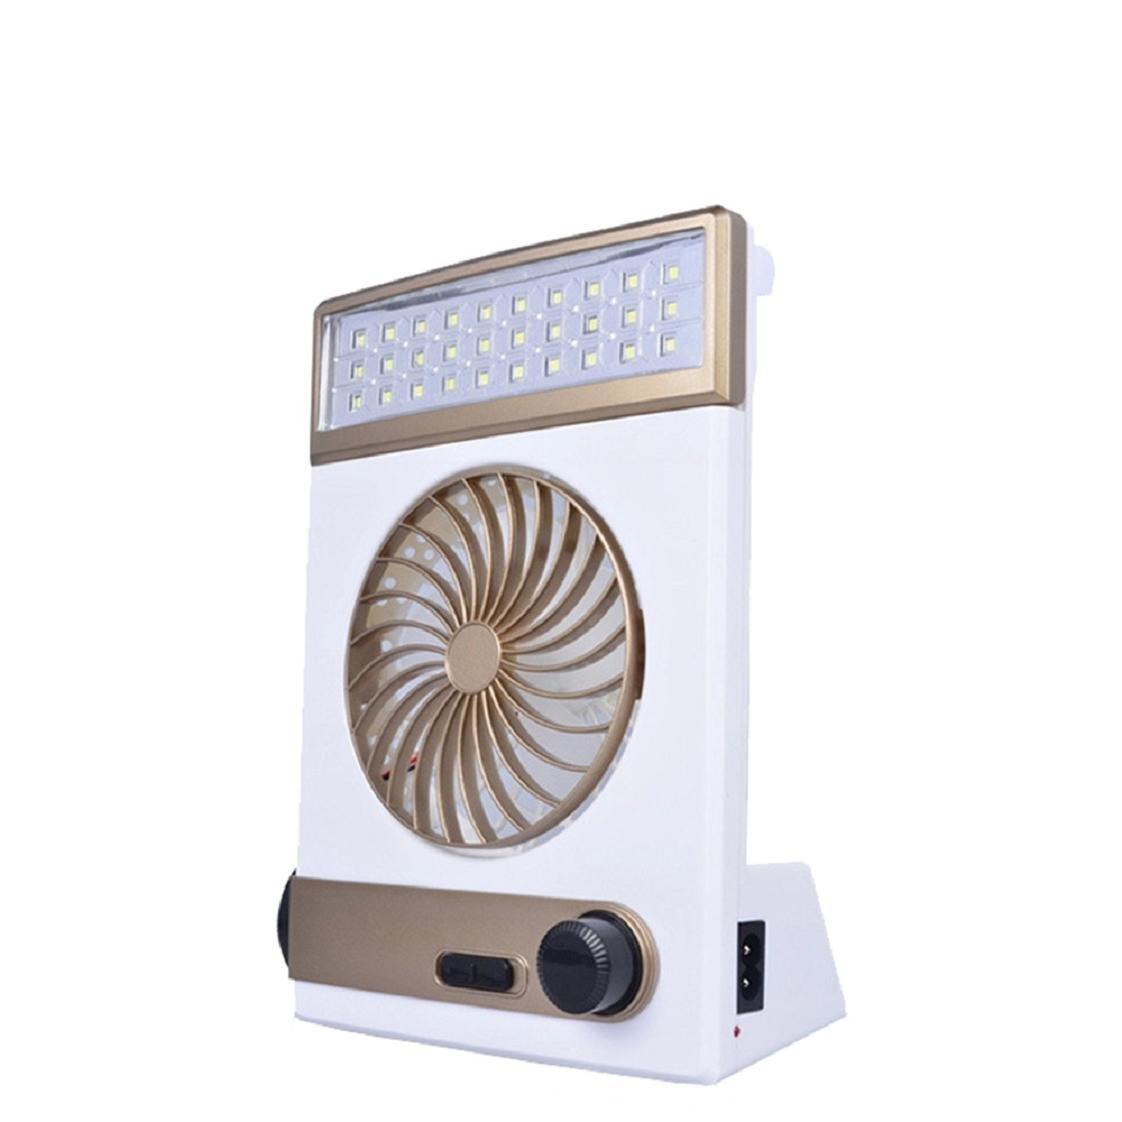 Mchoice Mini Solar Rechargeable Fan Multi-function LED Light Table Lamp Flashlight (Gold)